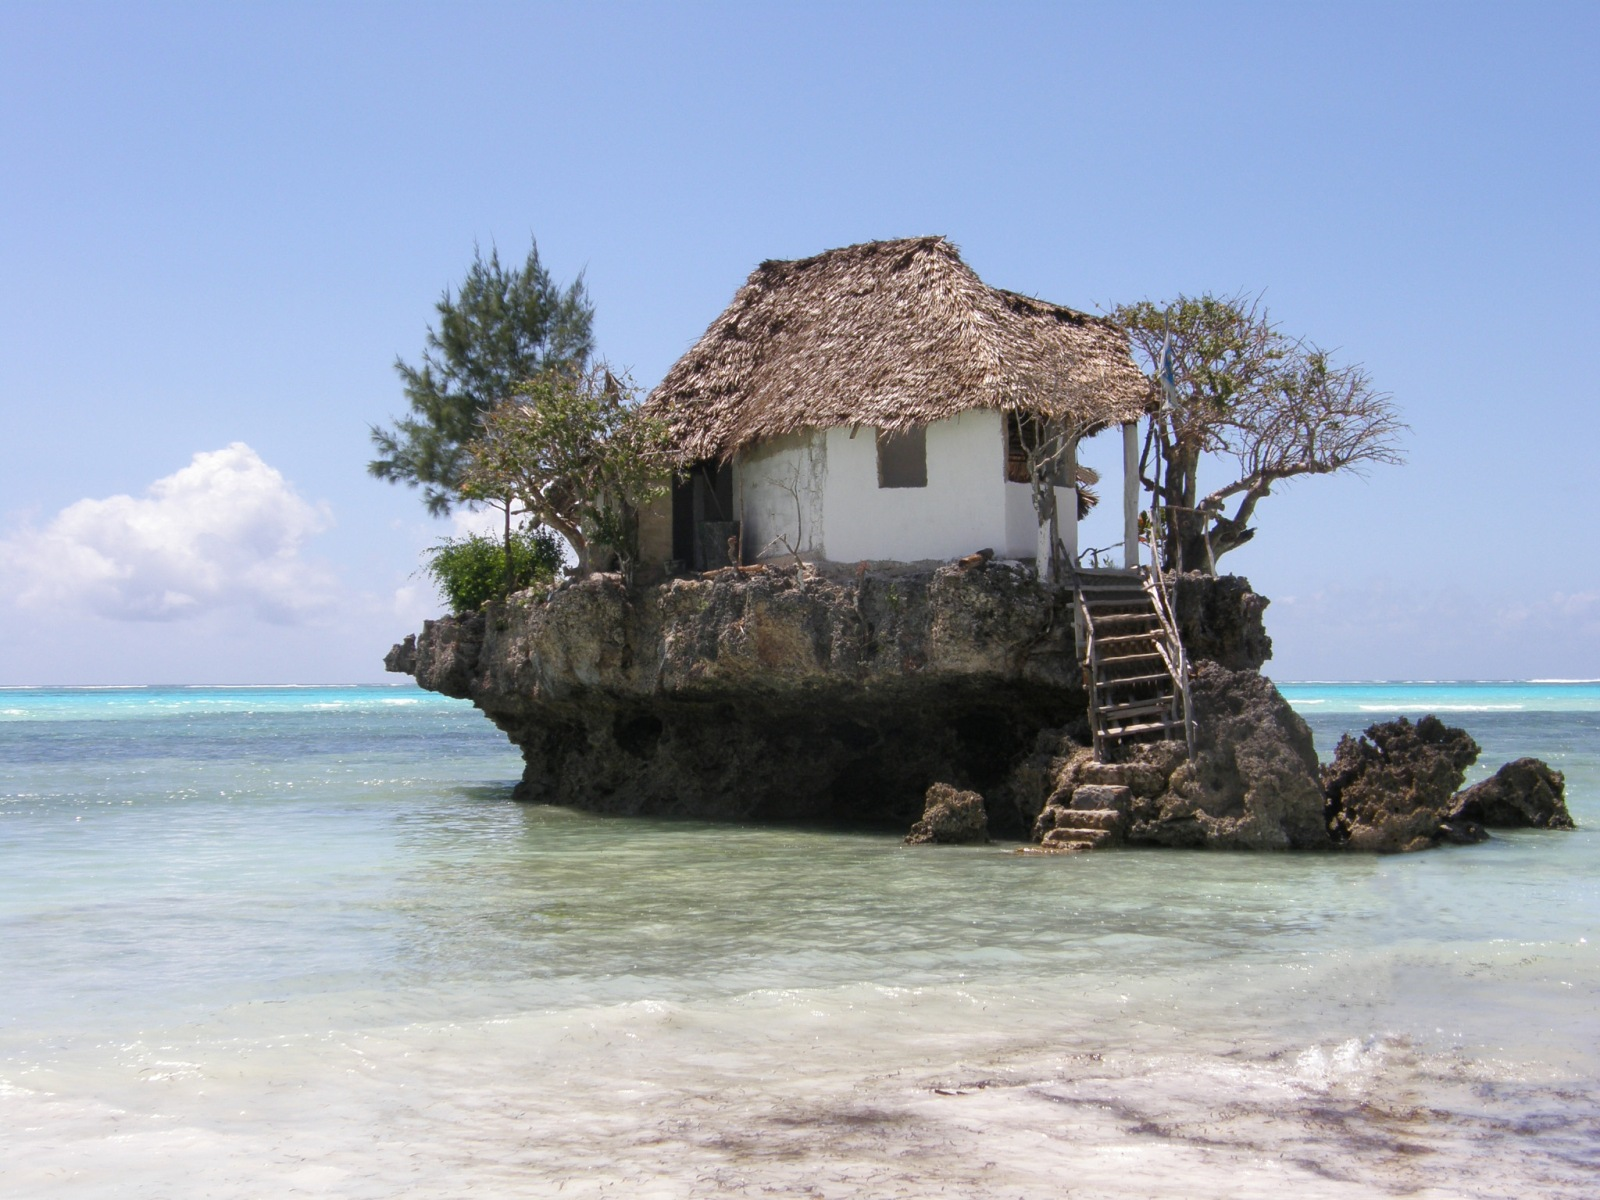 Do You Want To Visit Zanzibar Tanzania Tourism Places